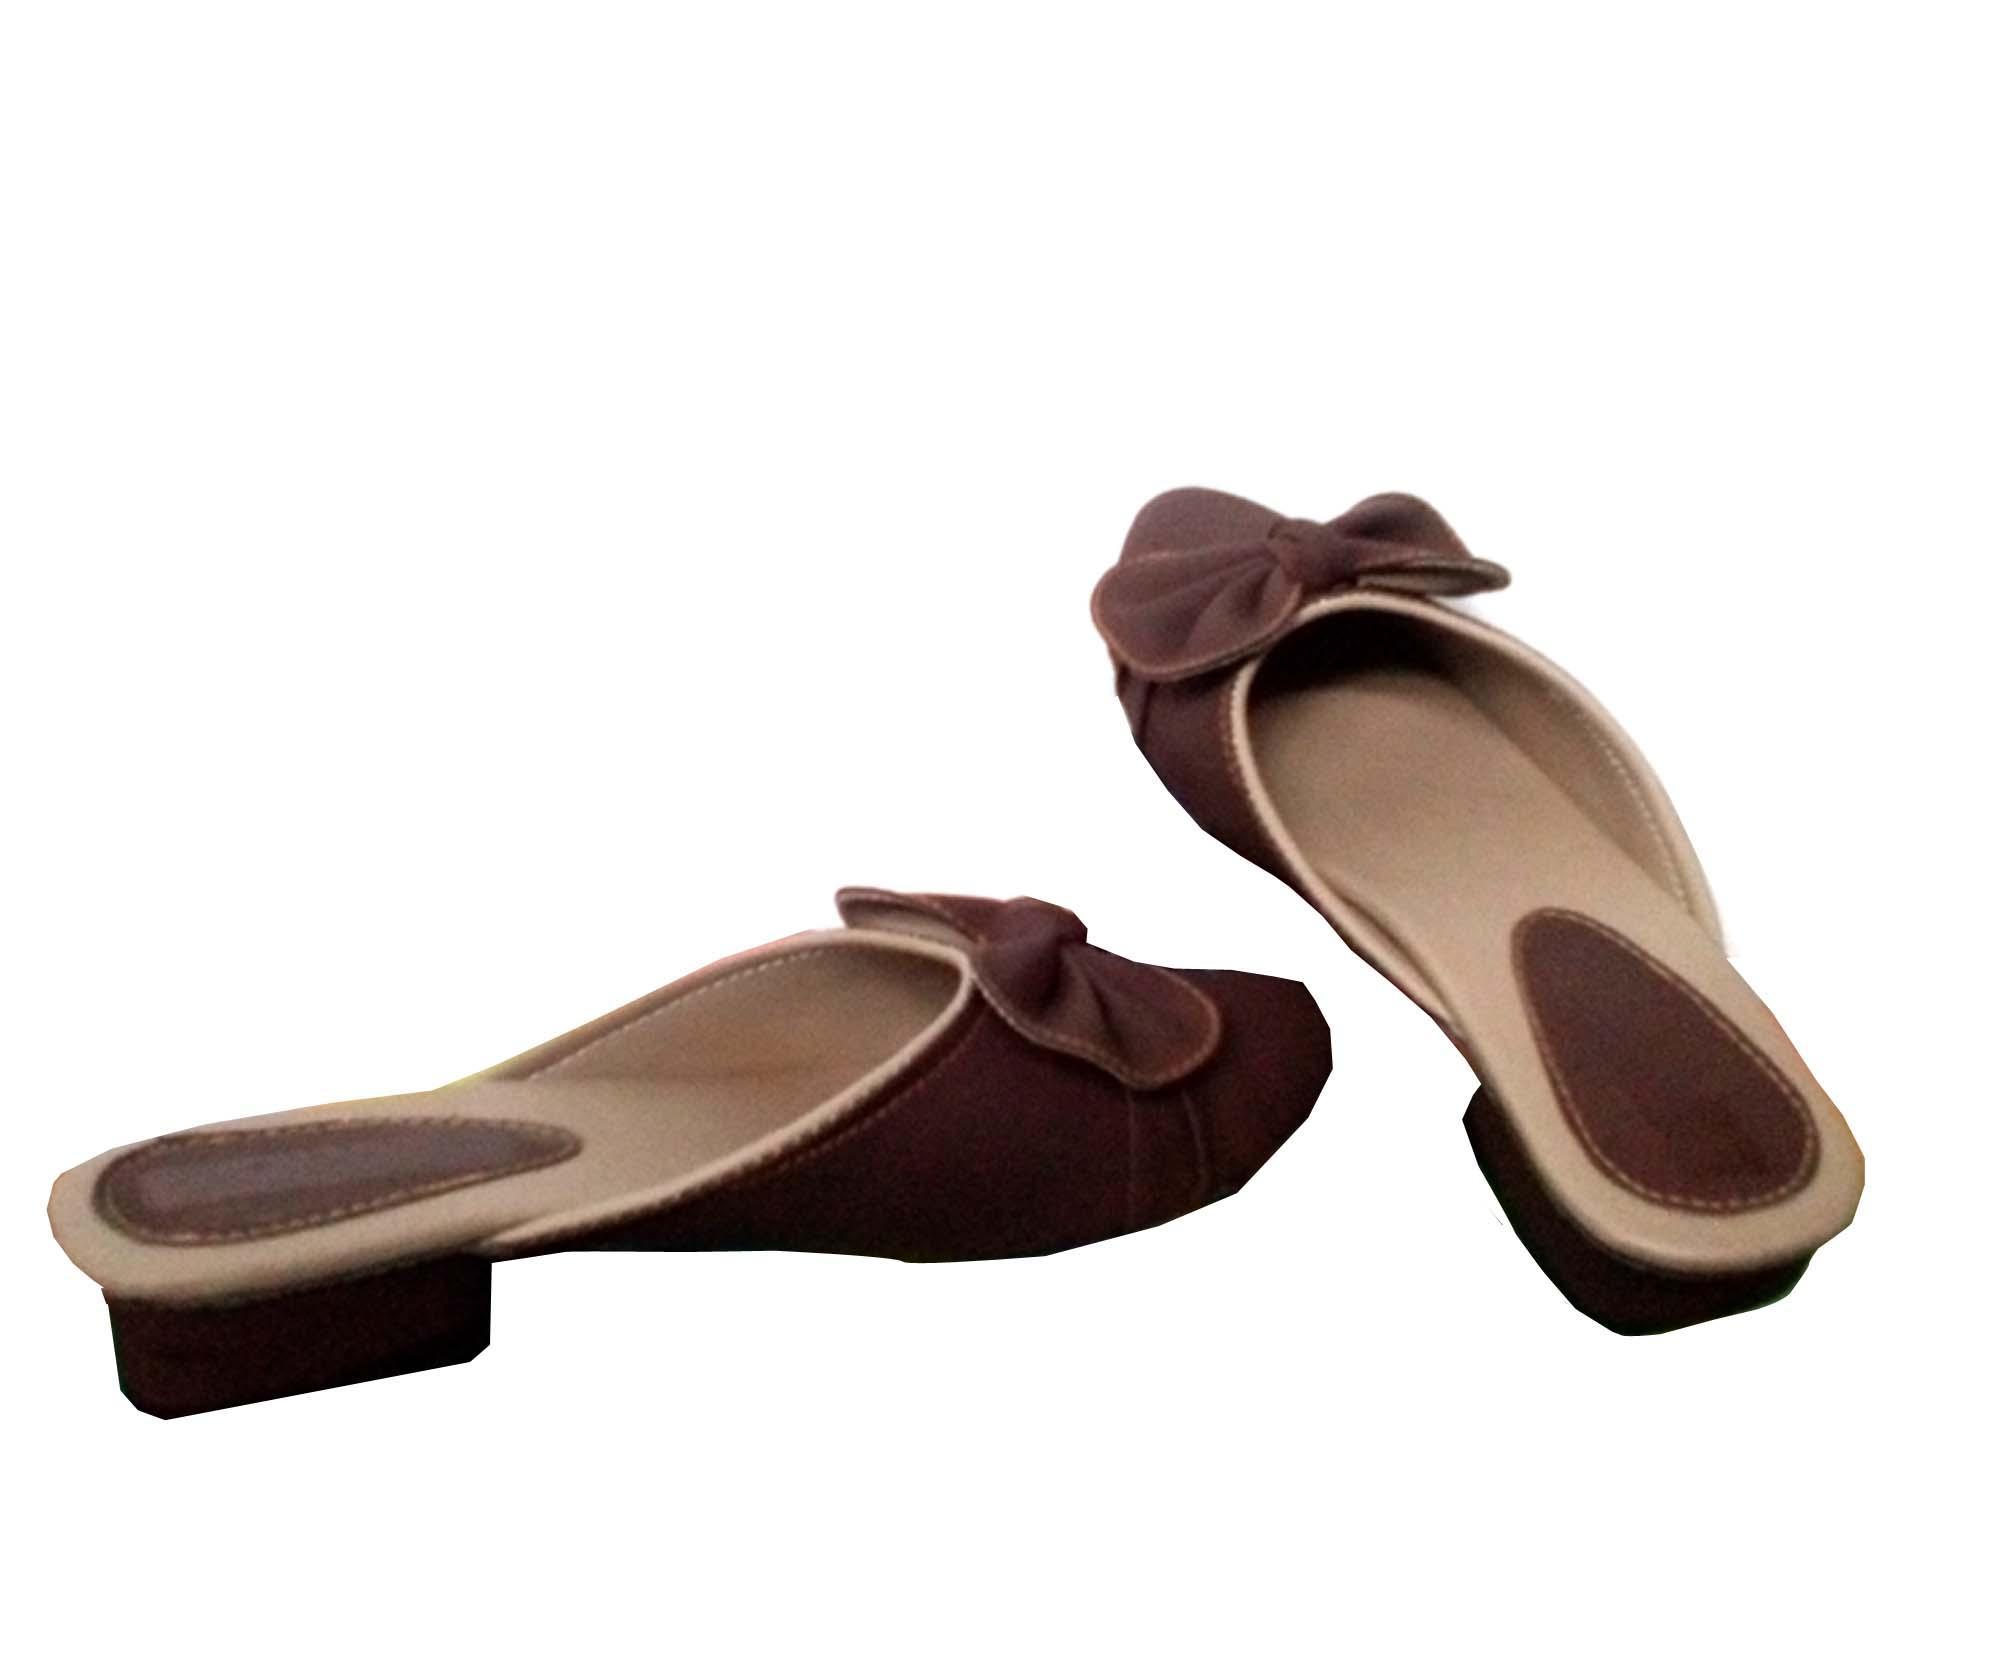 Diky Noval/ Sandal Wanita/ Sandal selop Wanita/ flatshoes / Sandal casual